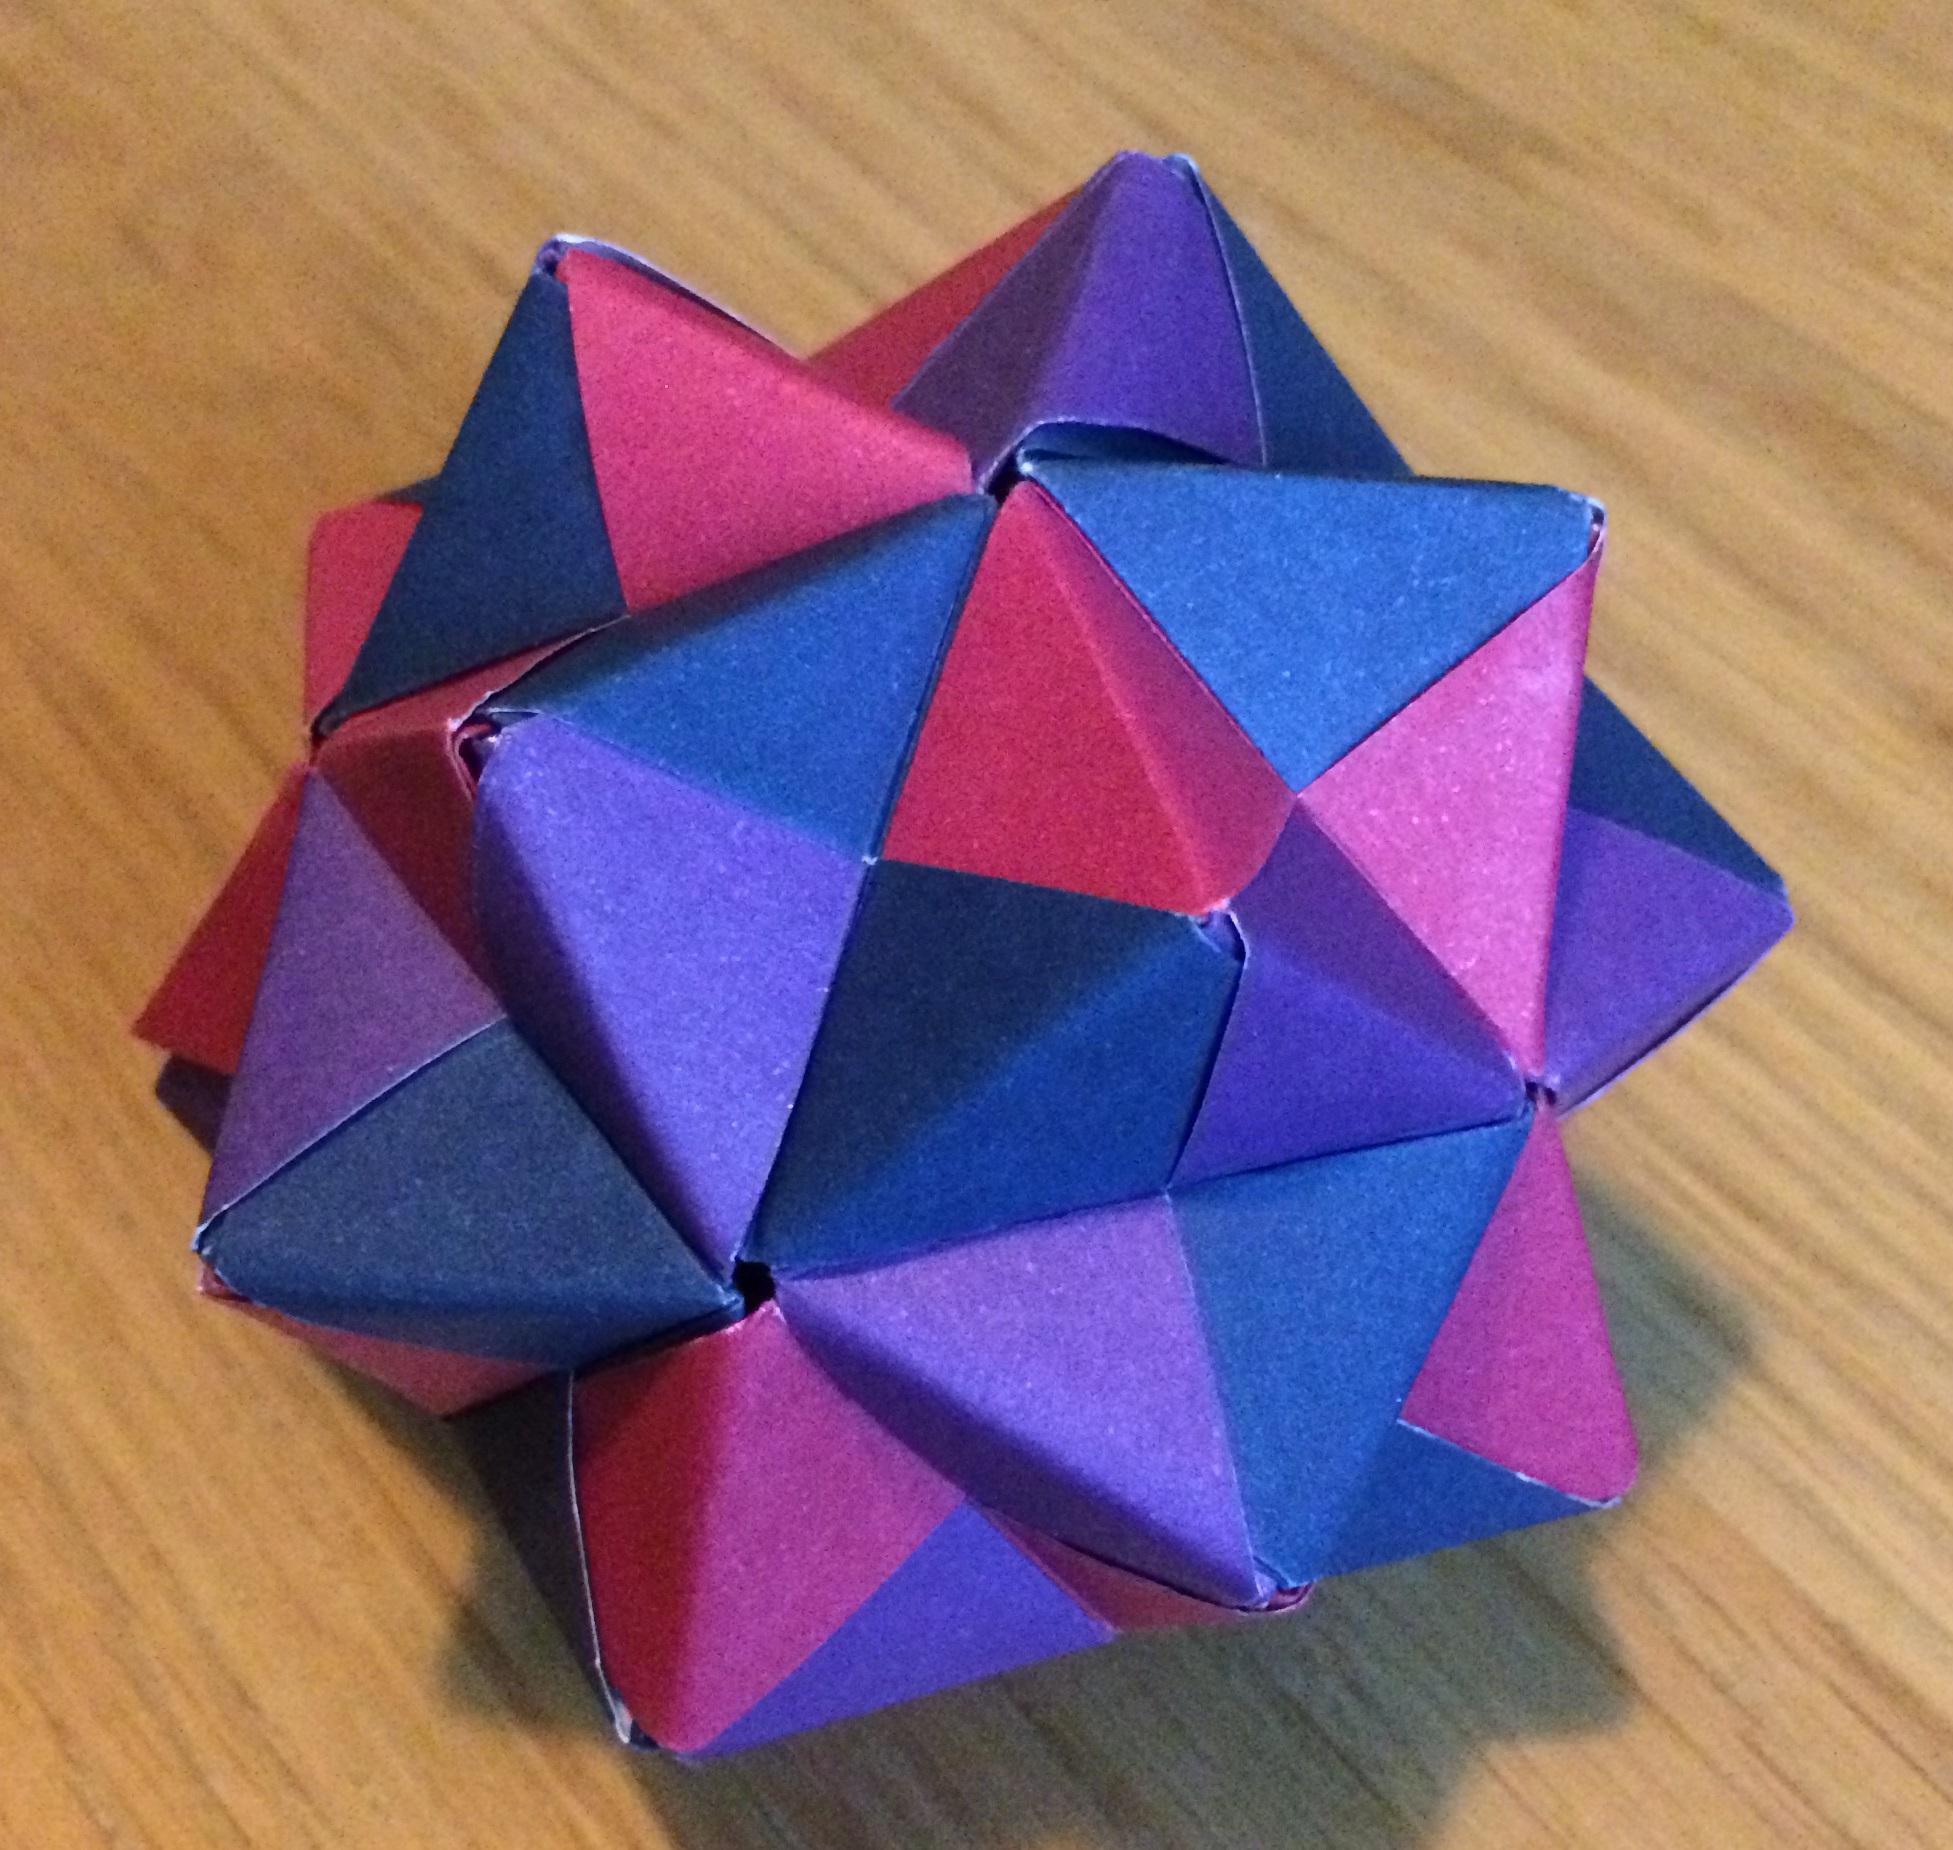 Modular origami polypompholyx cumulated icosahedron sonobe cc by sa 30 steve cook mightylinksfo